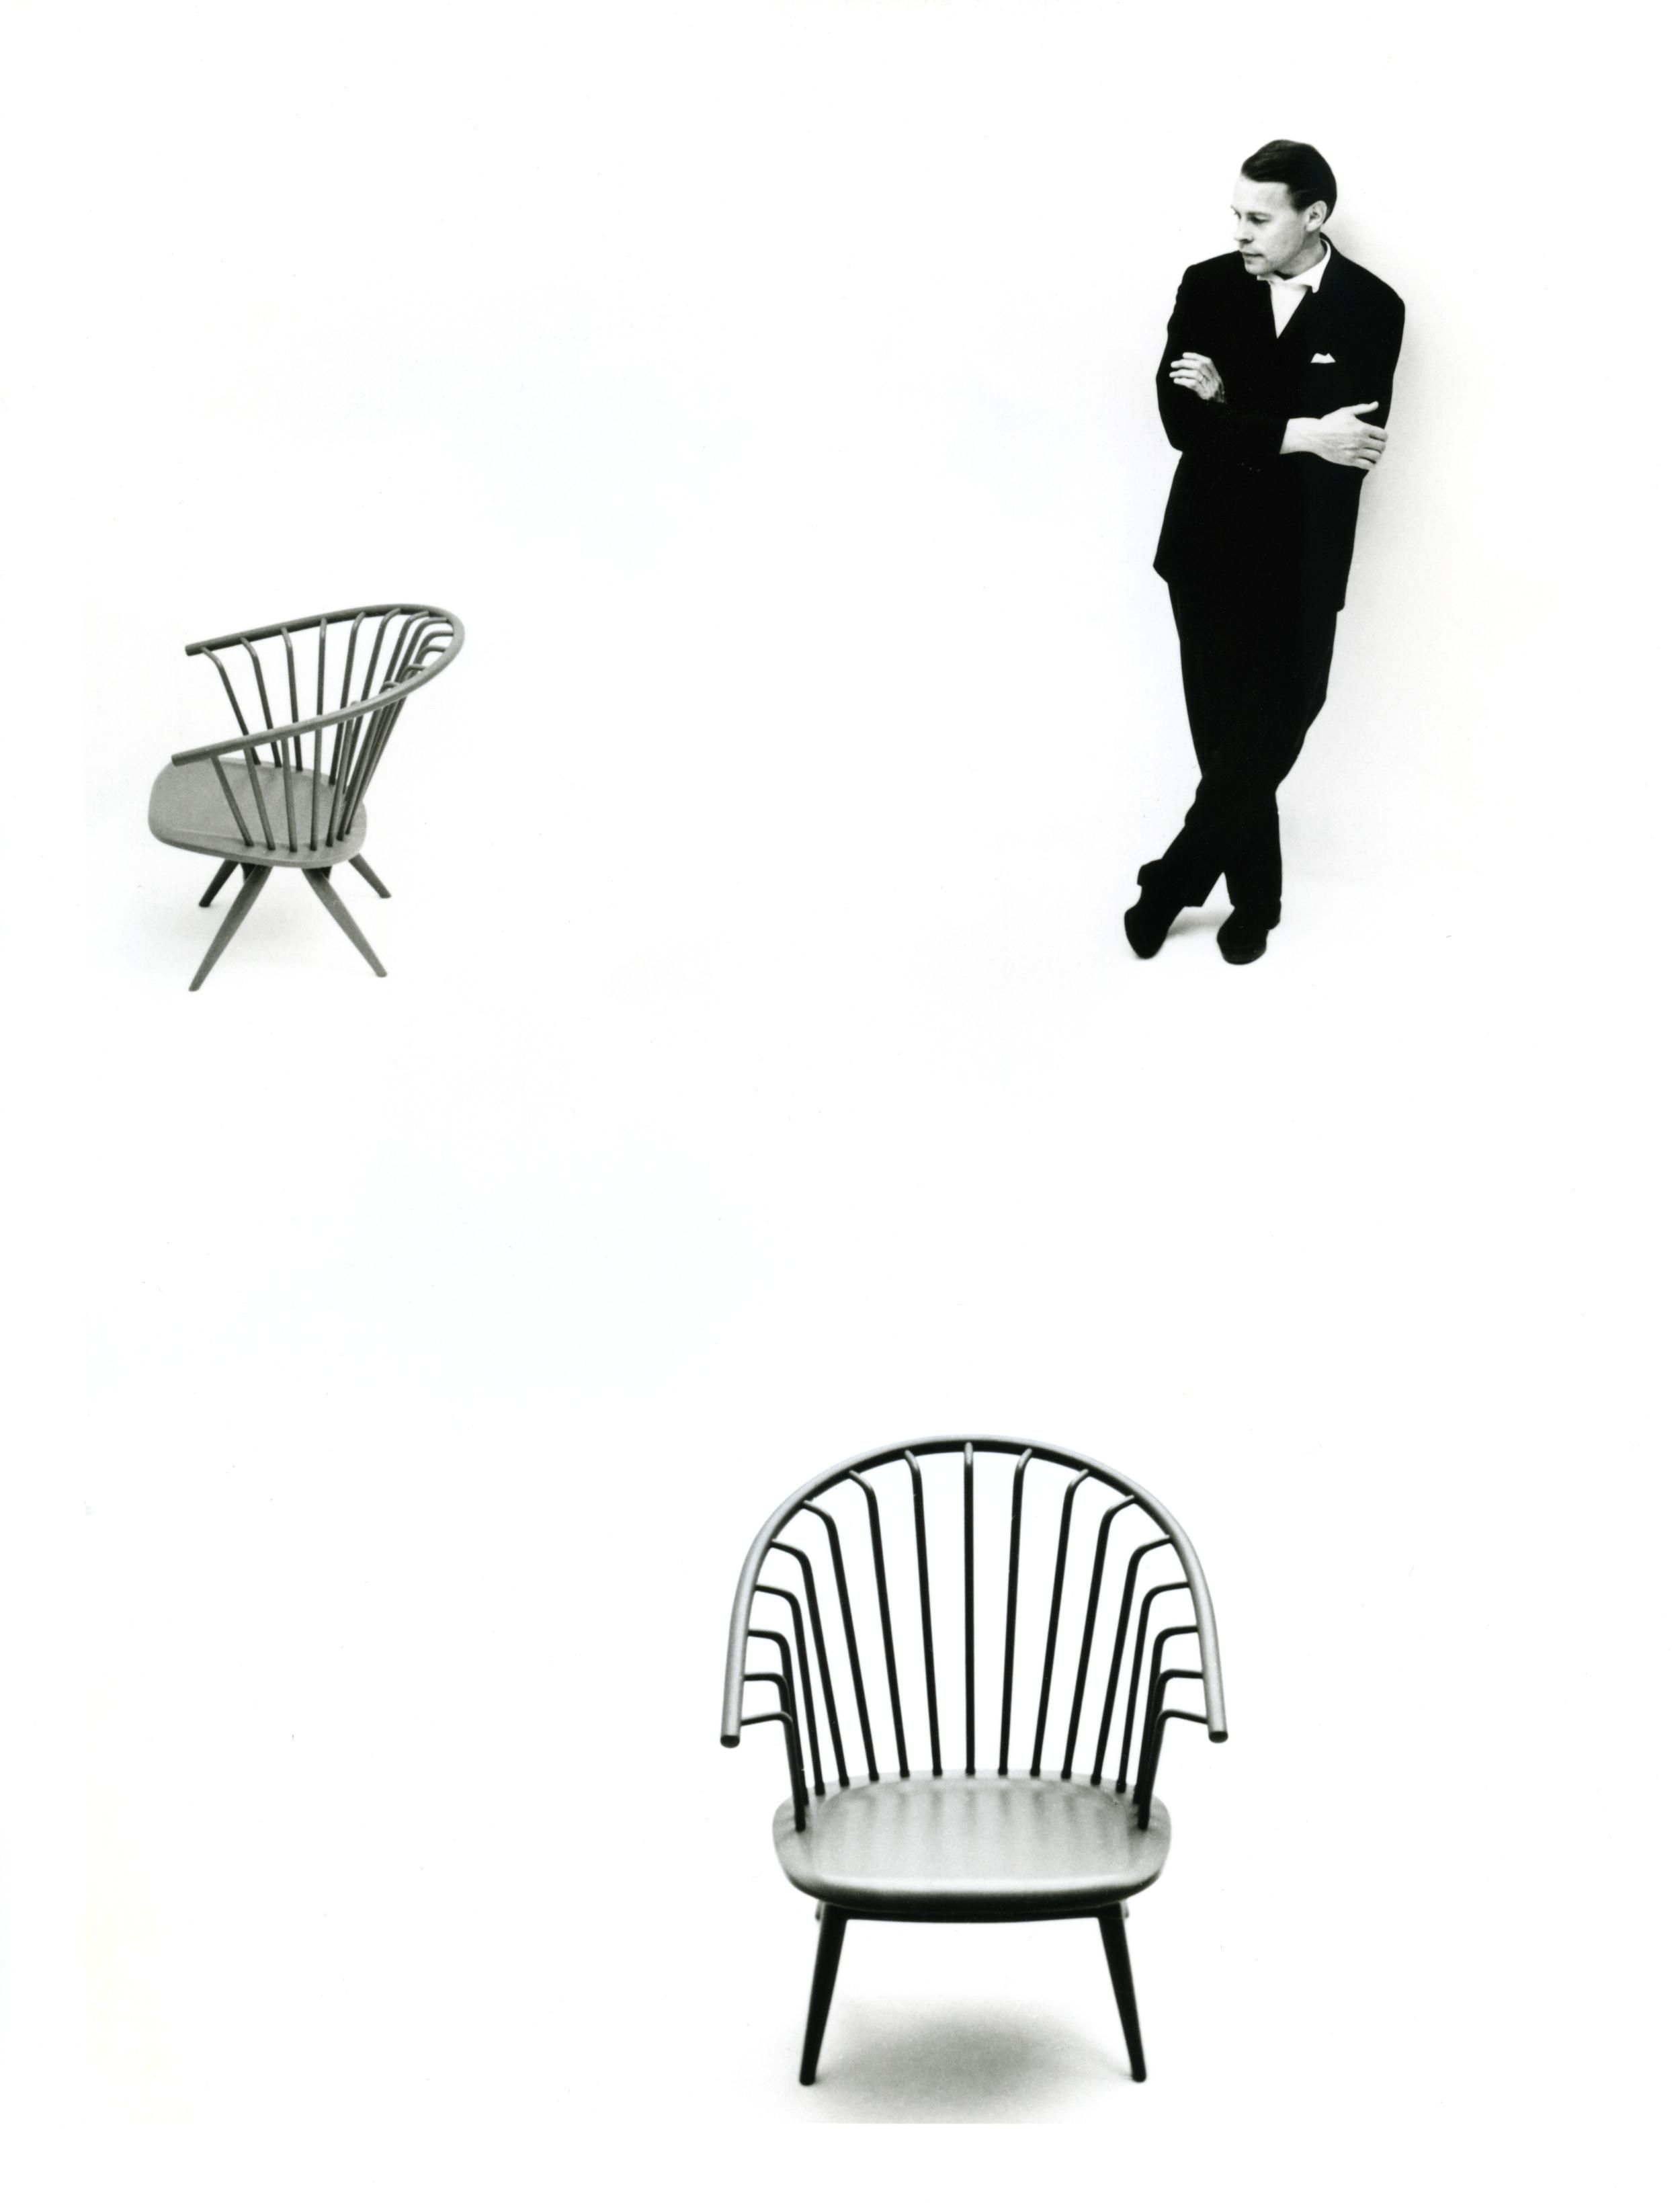 Ilmari Tapiovaara 100 years, 2014 (c) Design Museum Helsinki